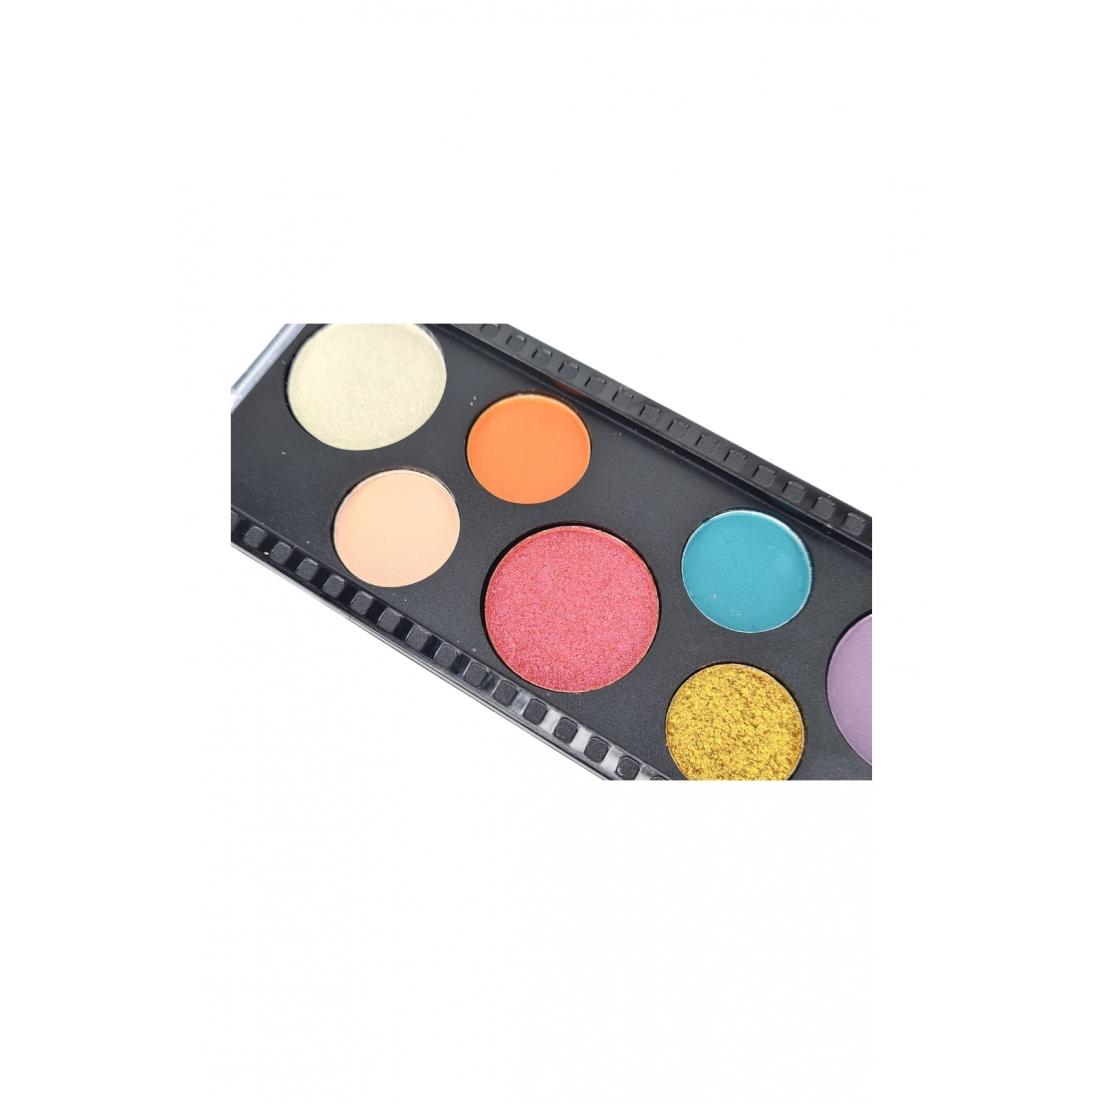 Paleta de sombras Gleam on the go SP Colors